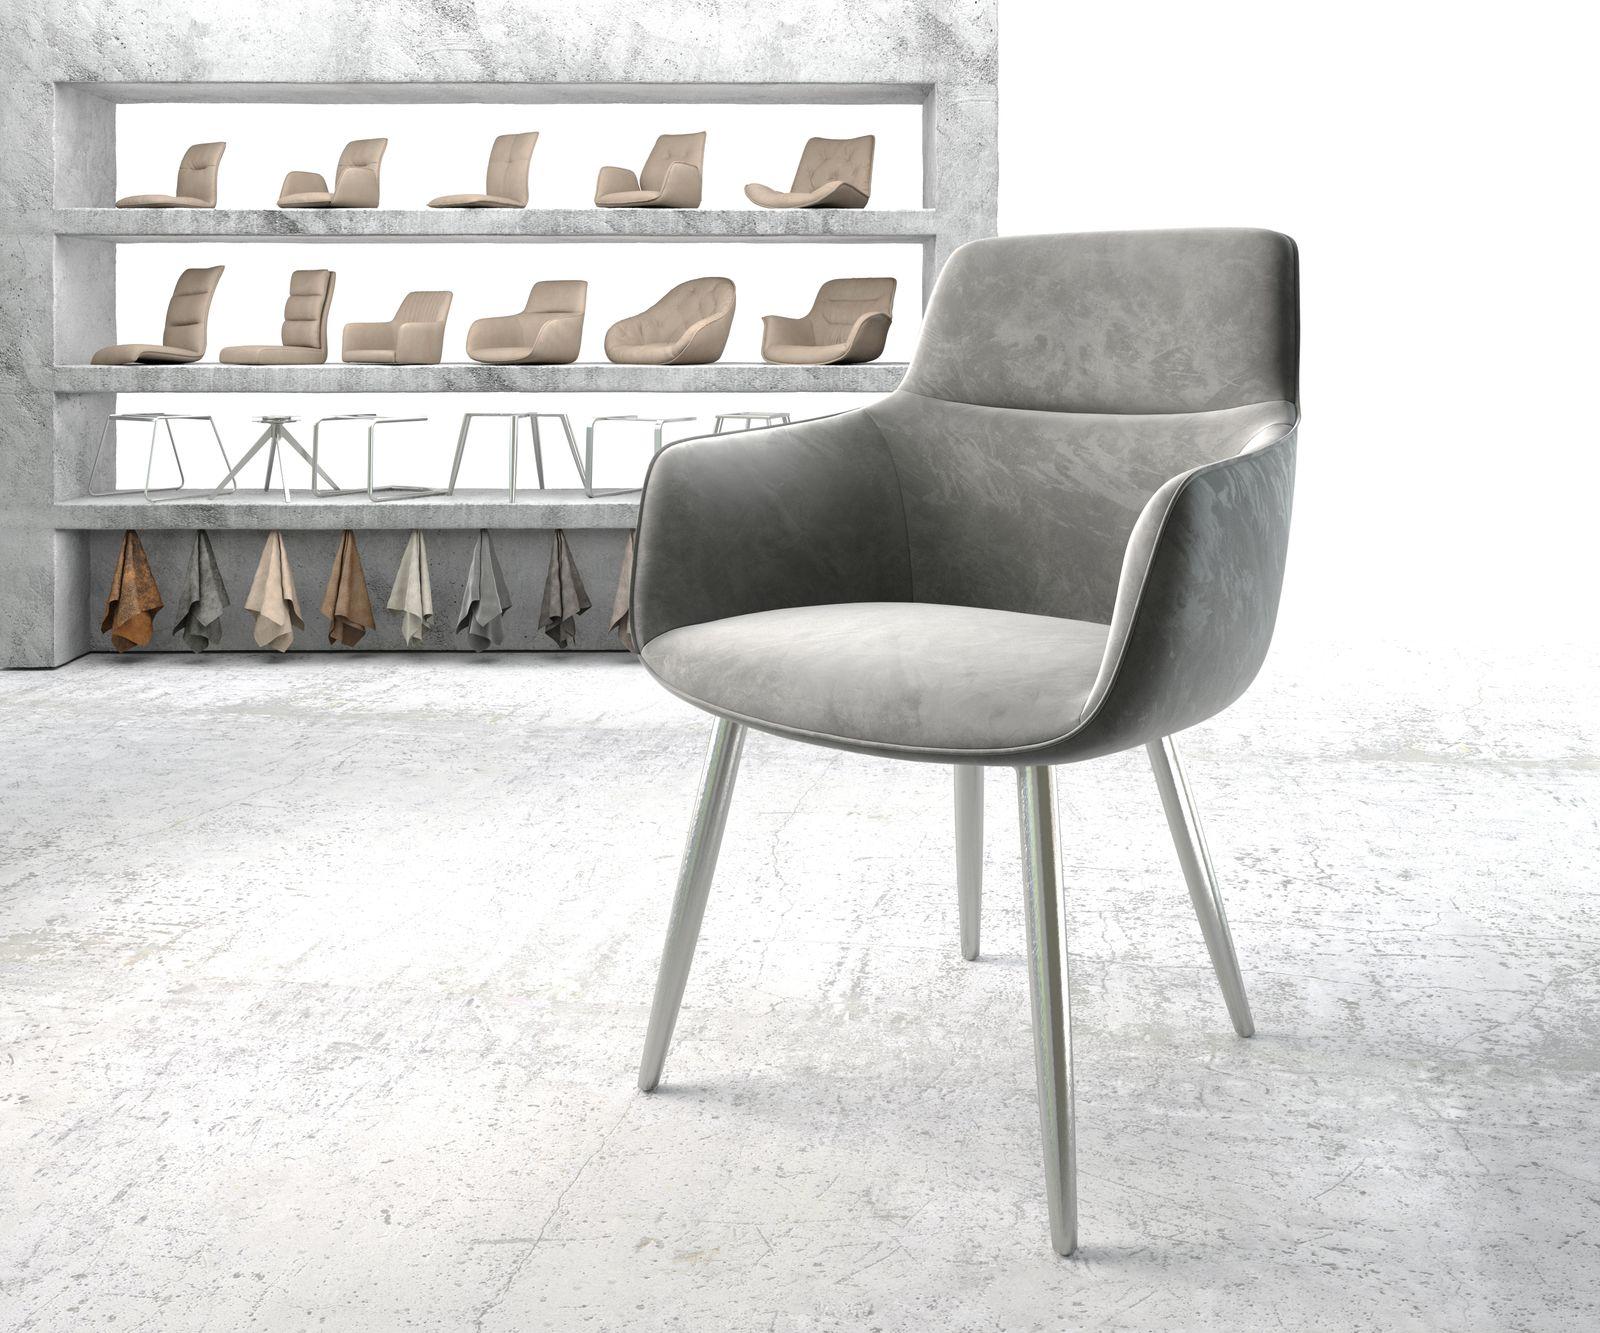 Esszimmerstuhl Pejo-Flex Grau Samt 4-Fuß konisch Edelstahl